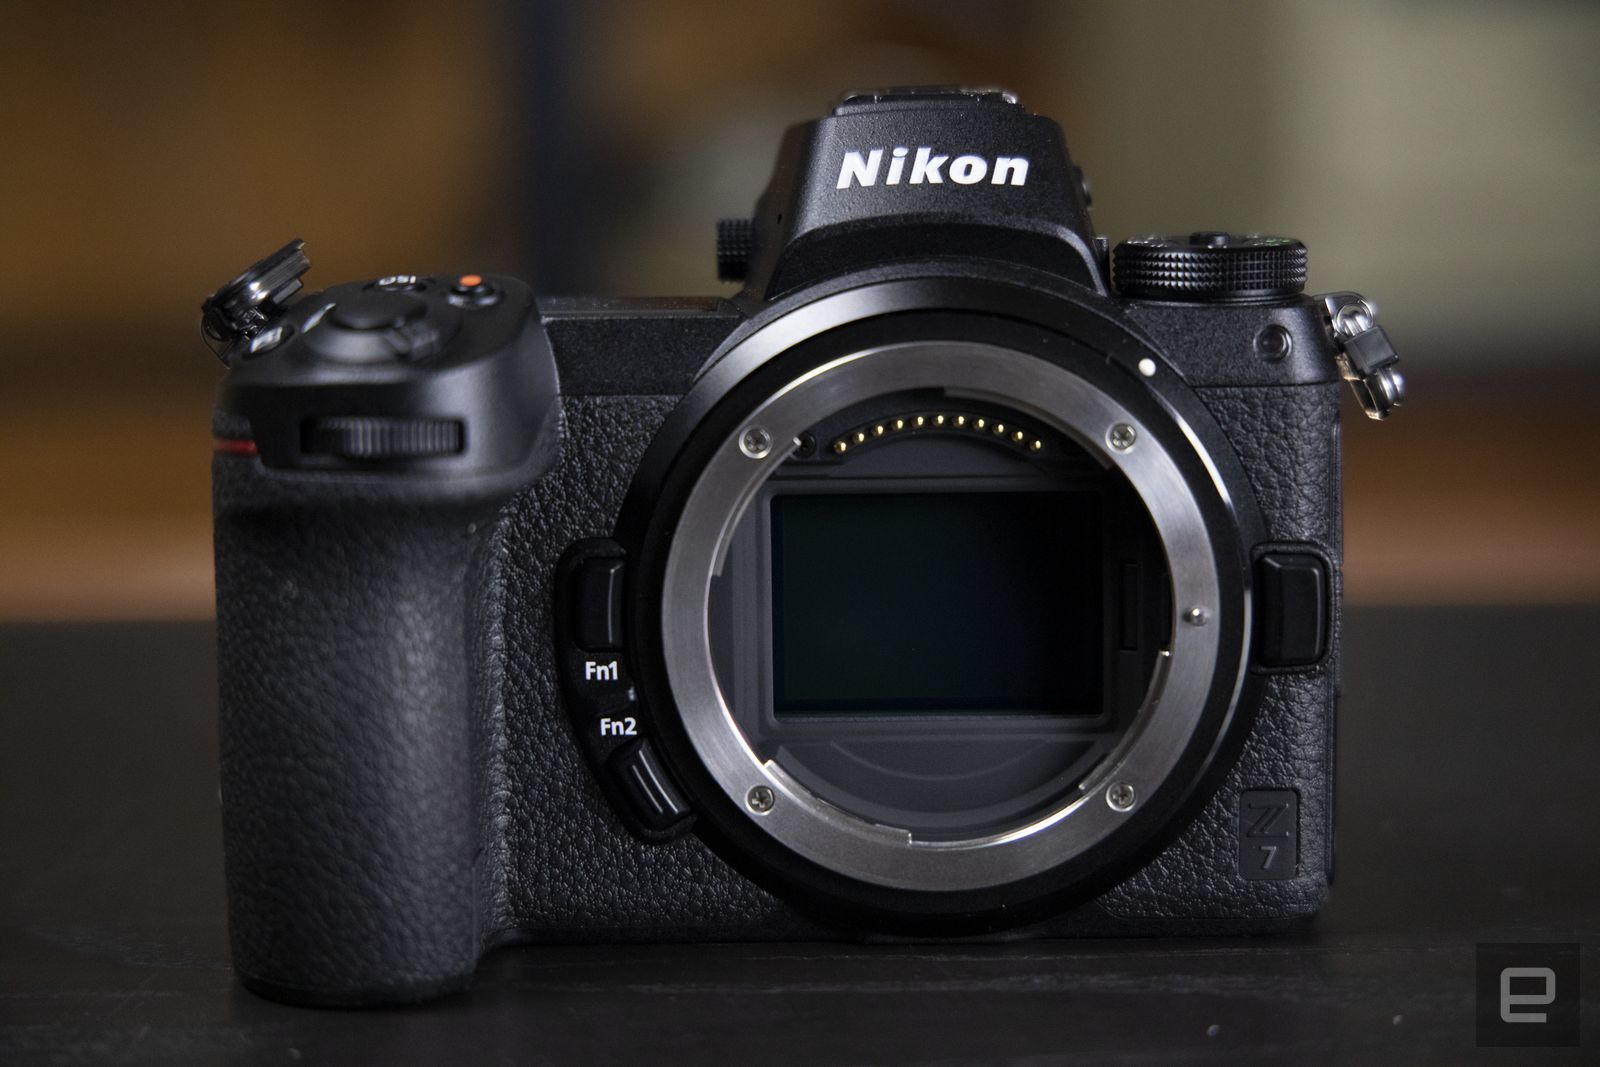 nikon-z7-full-frame-mirrorless-camera-9